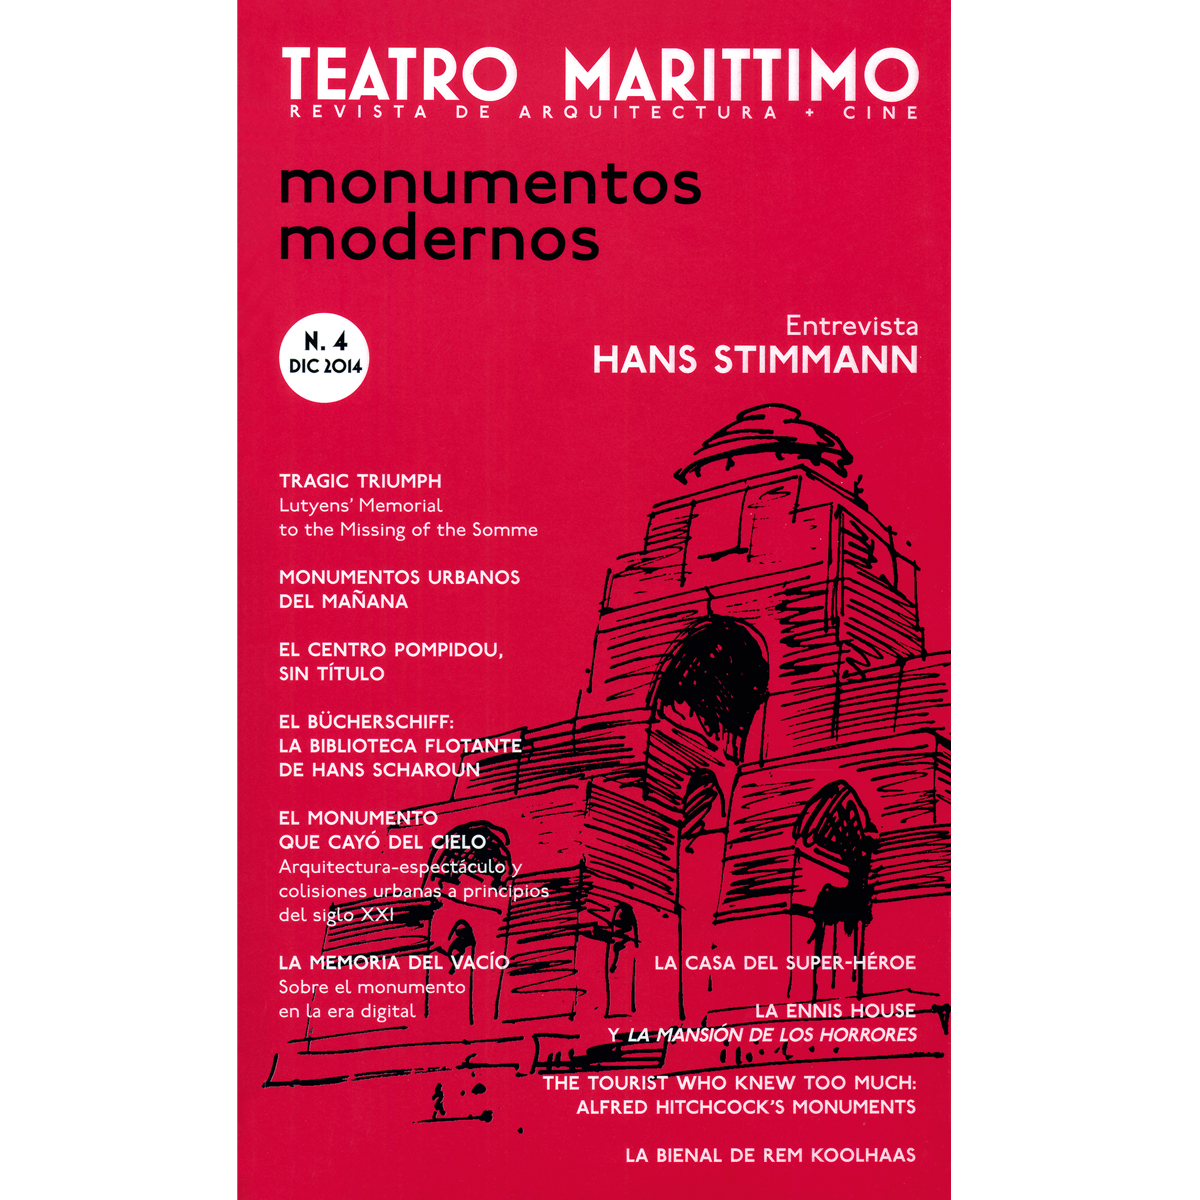 Teatro Marittimo: Monumentos modernos